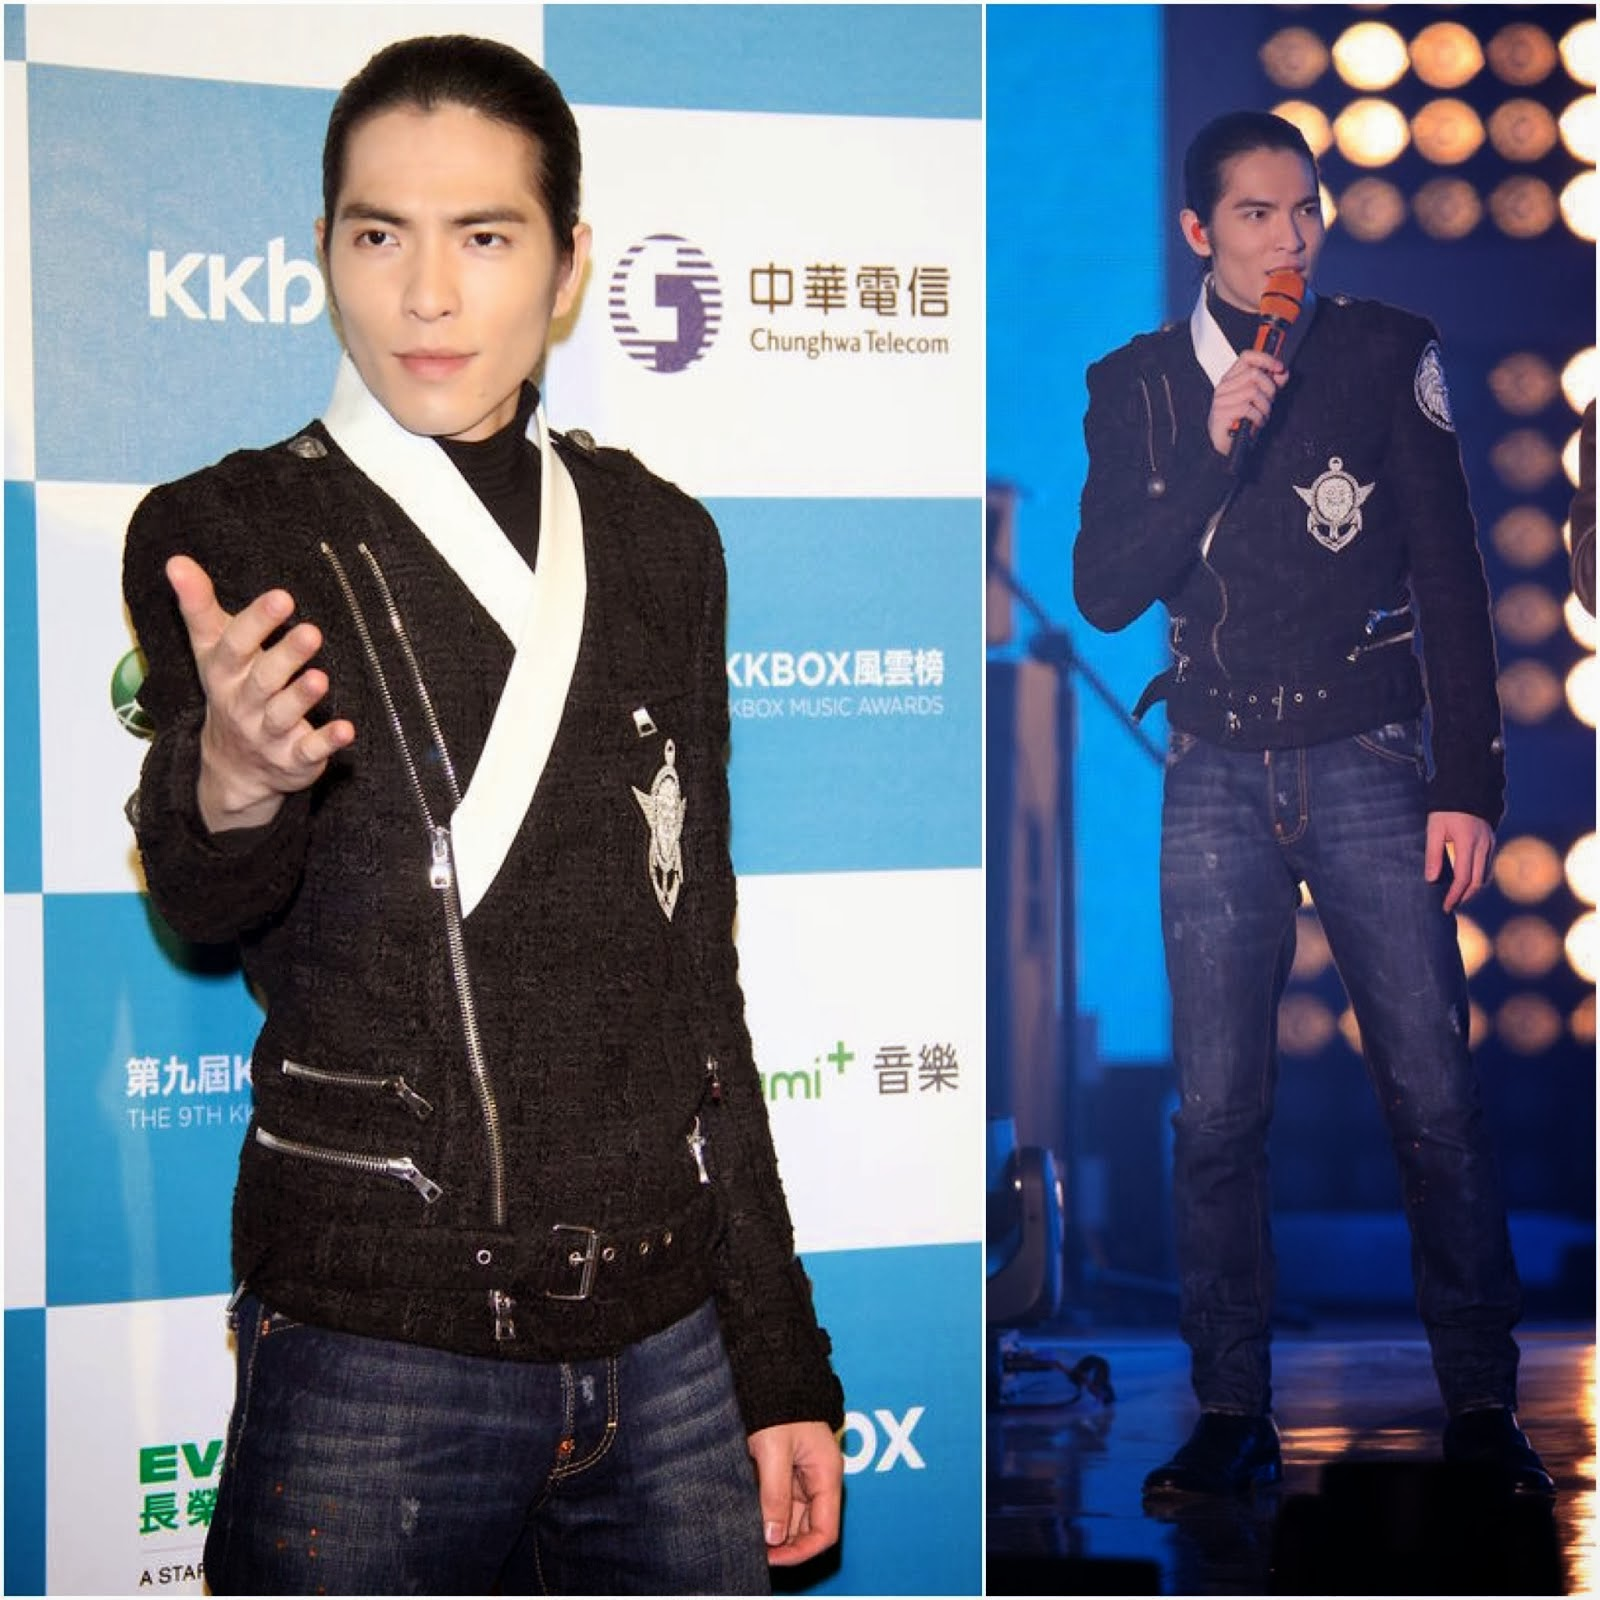 Jam Hsiao [萧敬腾] in Balmain - 9th Annual KKBOX Awards [第九届KKBOX风云榜]